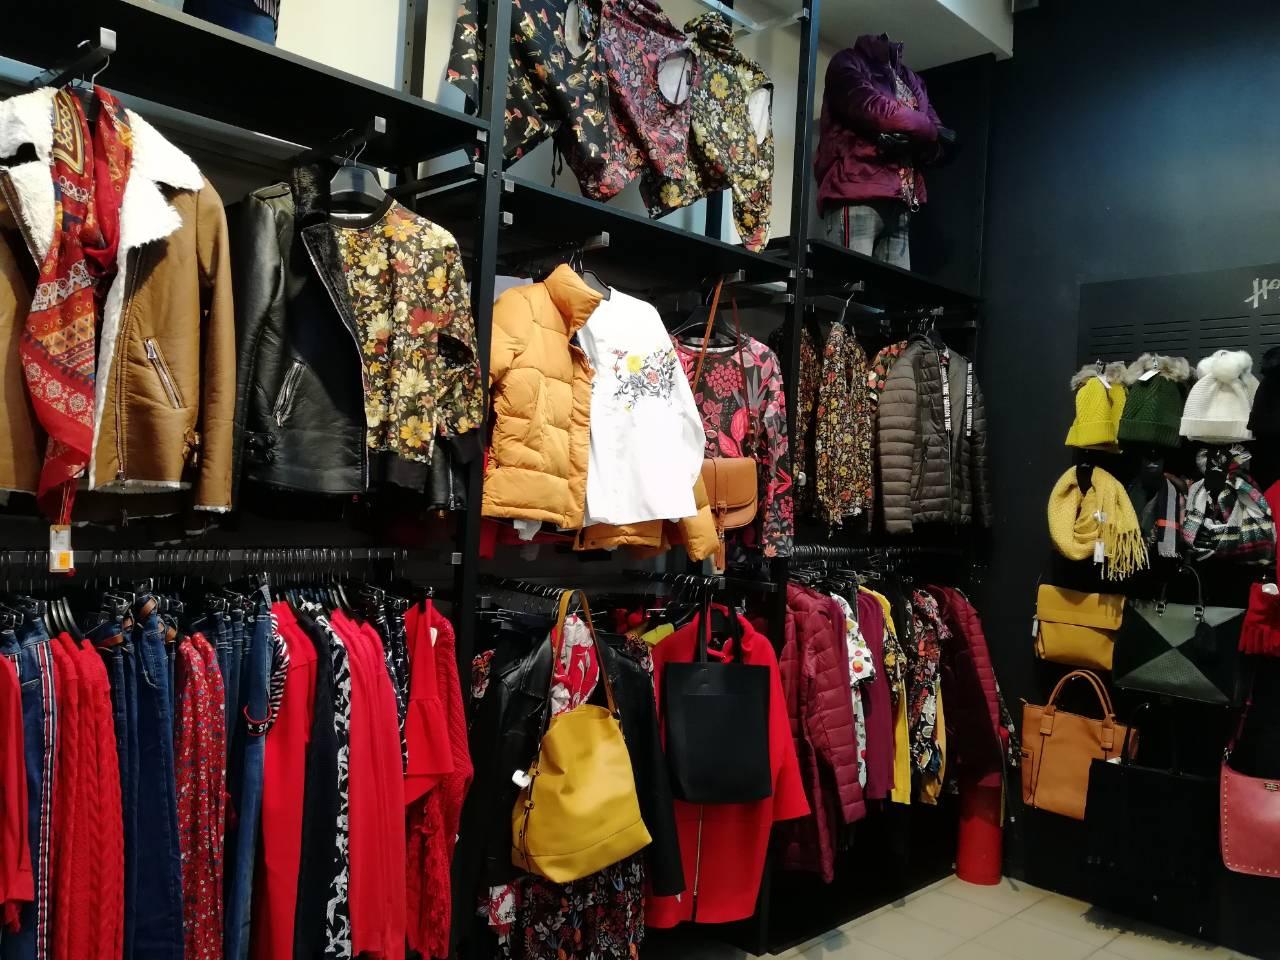 shops_scotfree_img_IMG-45f4e709533284f0f7717f2fd06f0847-V